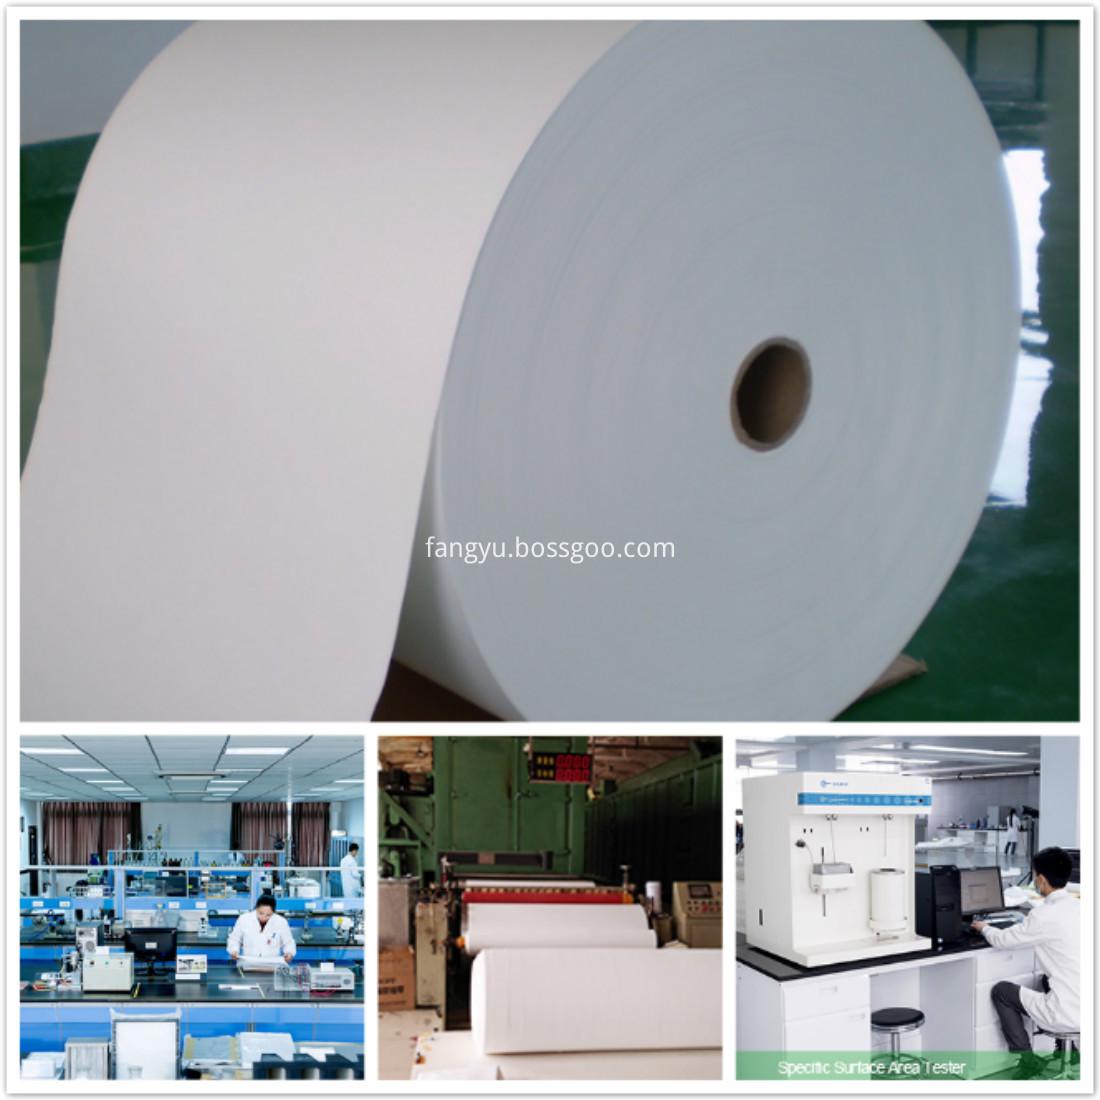 U15 Air Filter Paper